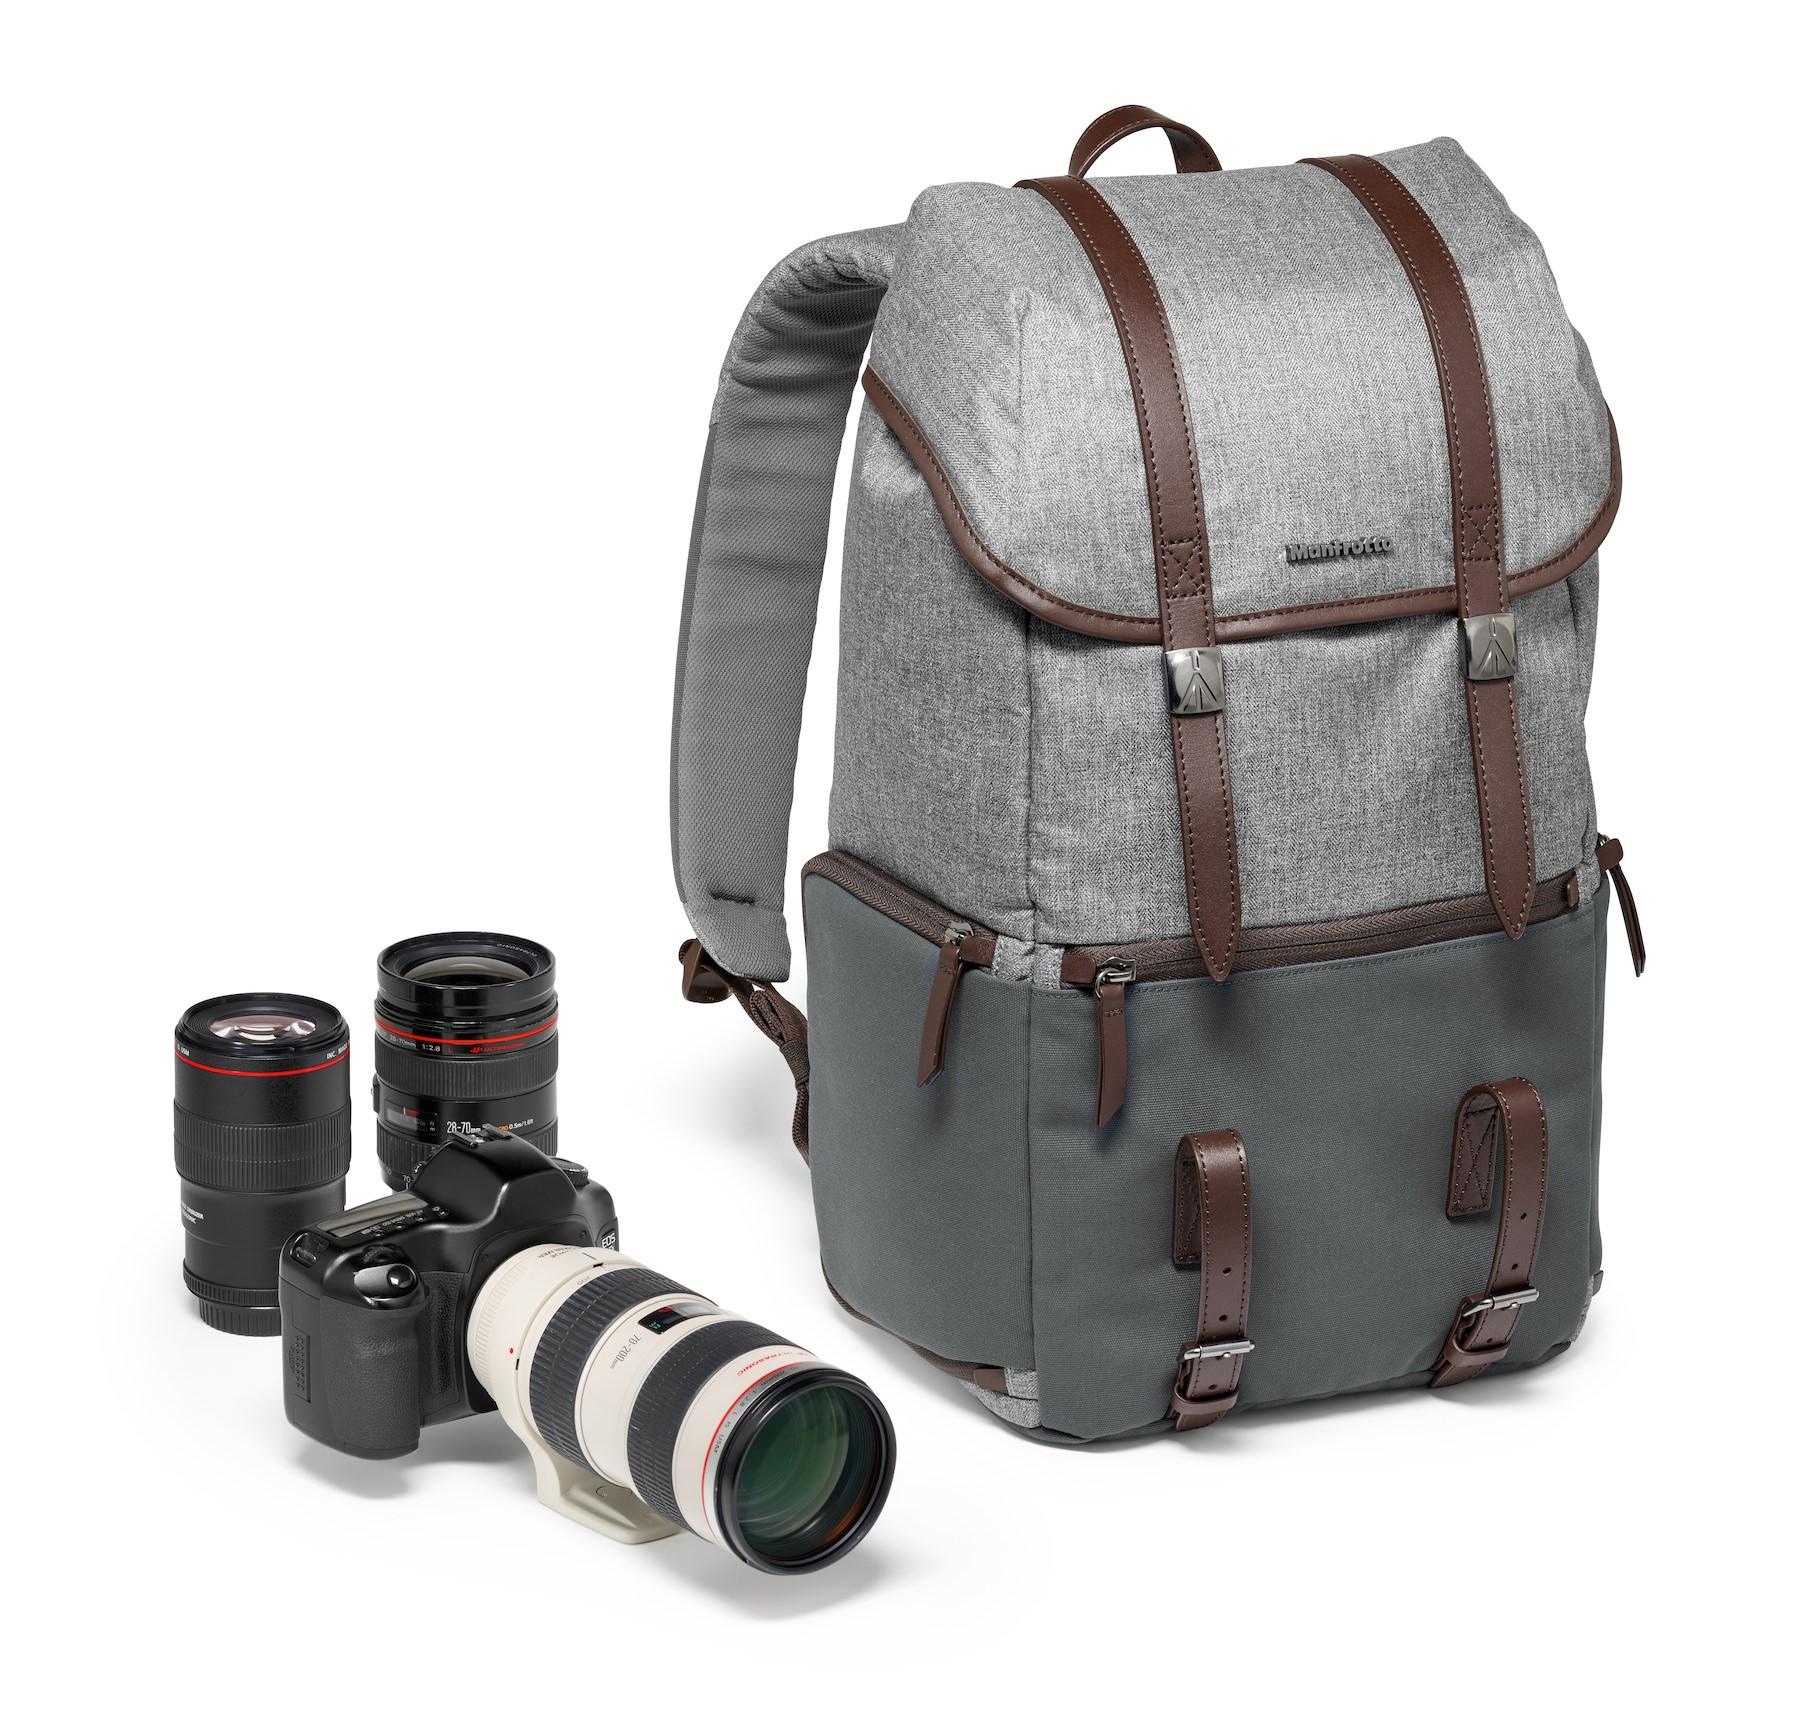 Manfrotto Windsor Explorer Camera Backpack $49.99 Costco B&M & Online